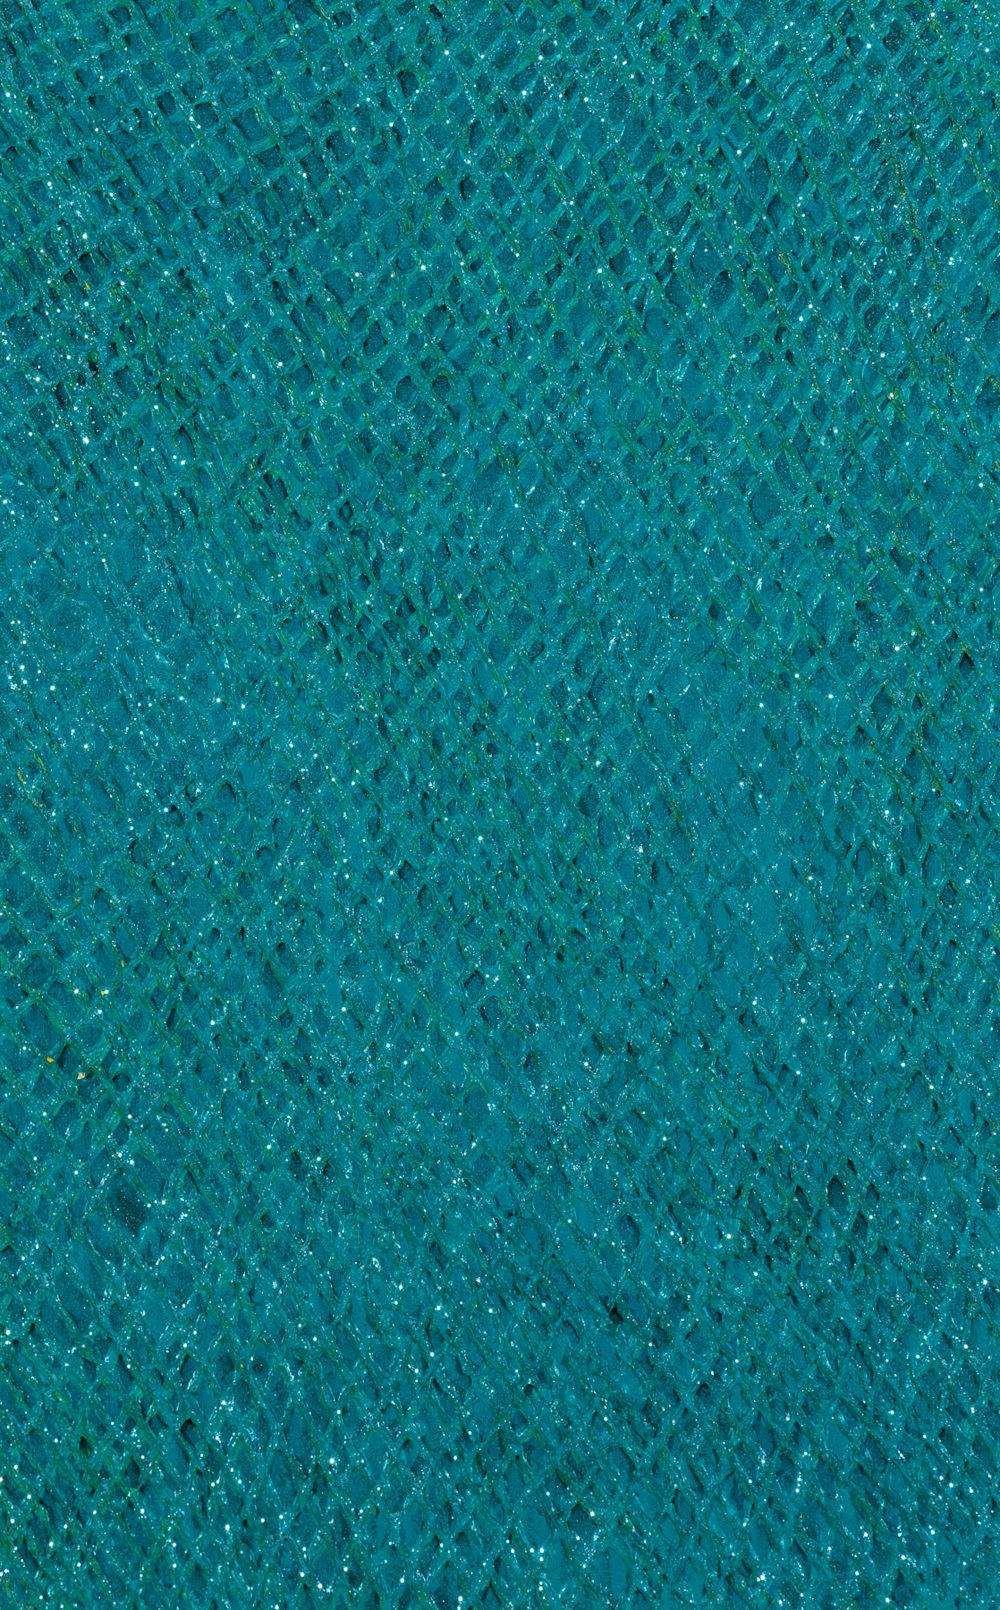 Bright Turquoise